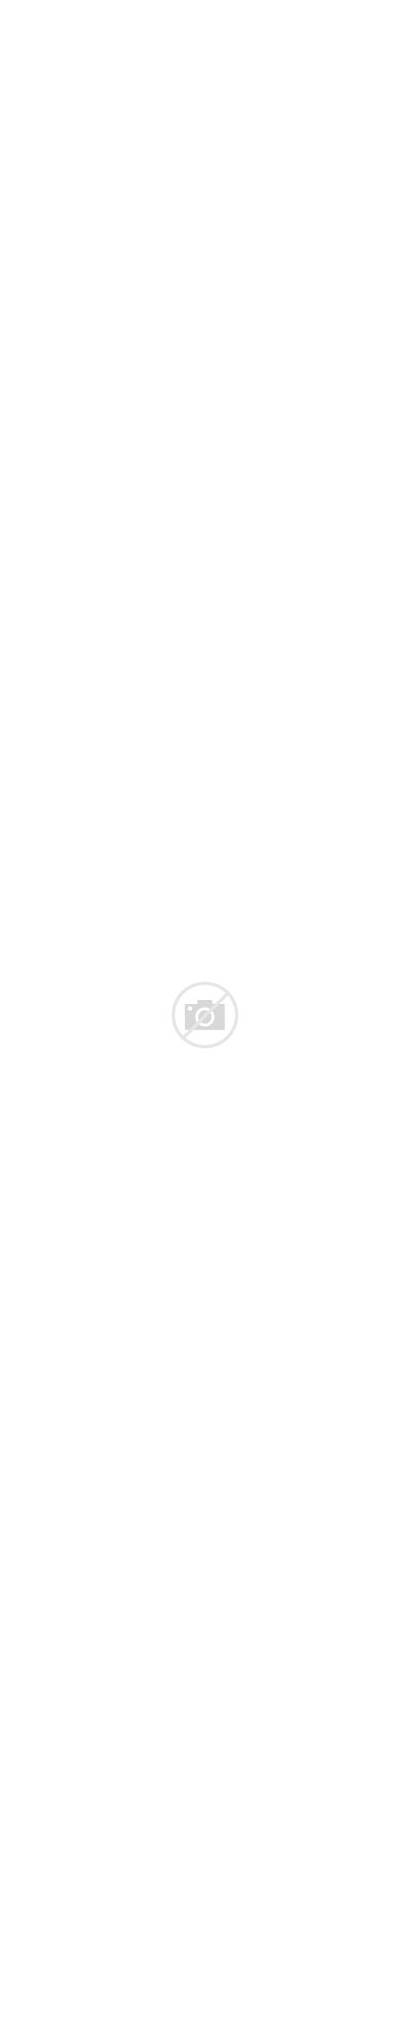 Lakeridge Winery Cabernet Sauvignon Wine Vineyards Welcome